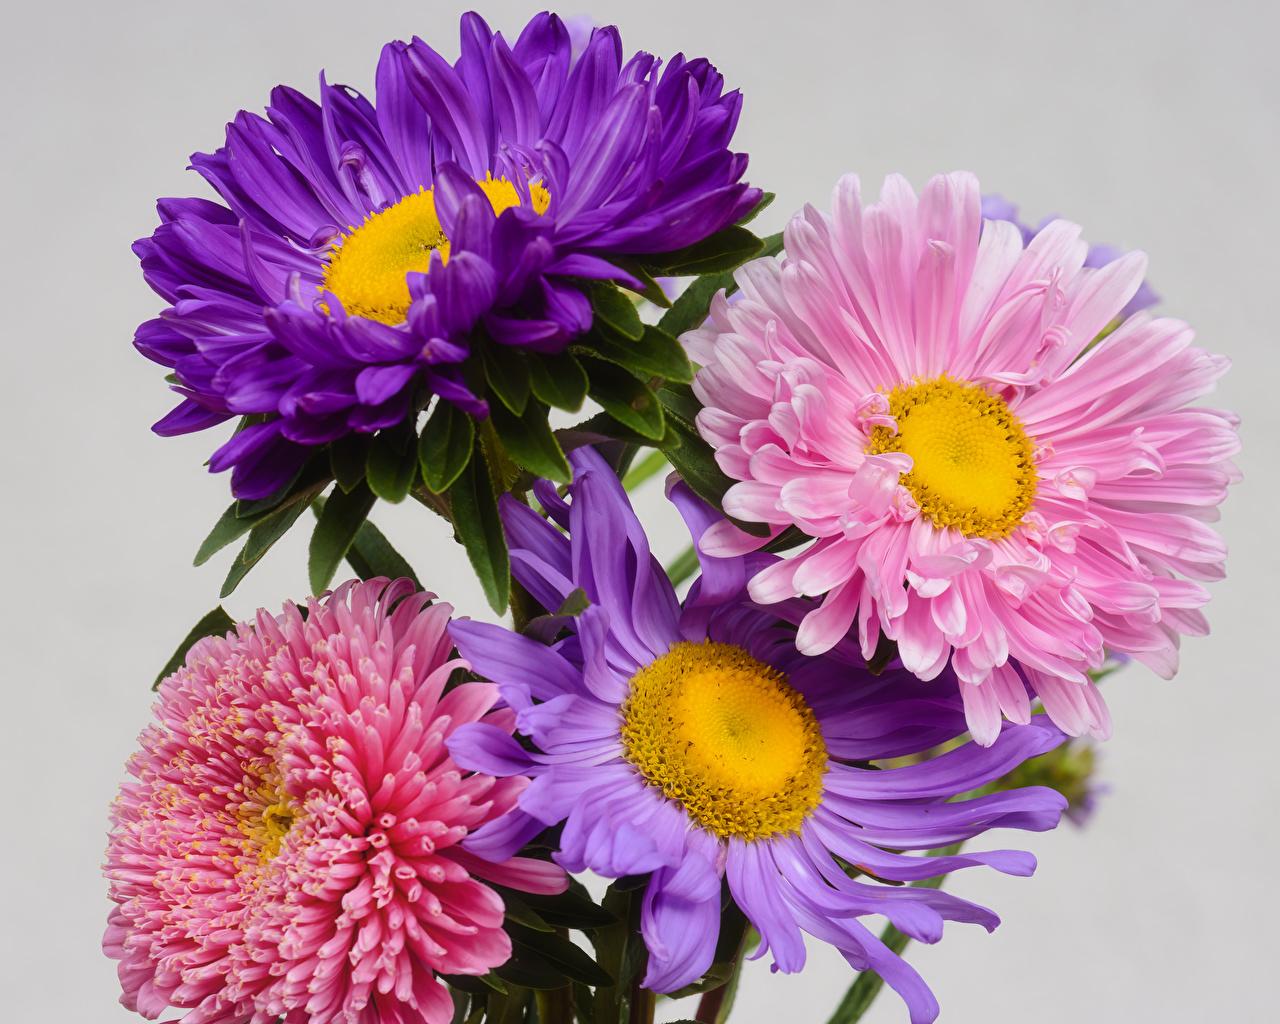 Asters De cerca Fondo gris Multicolor flor Flores